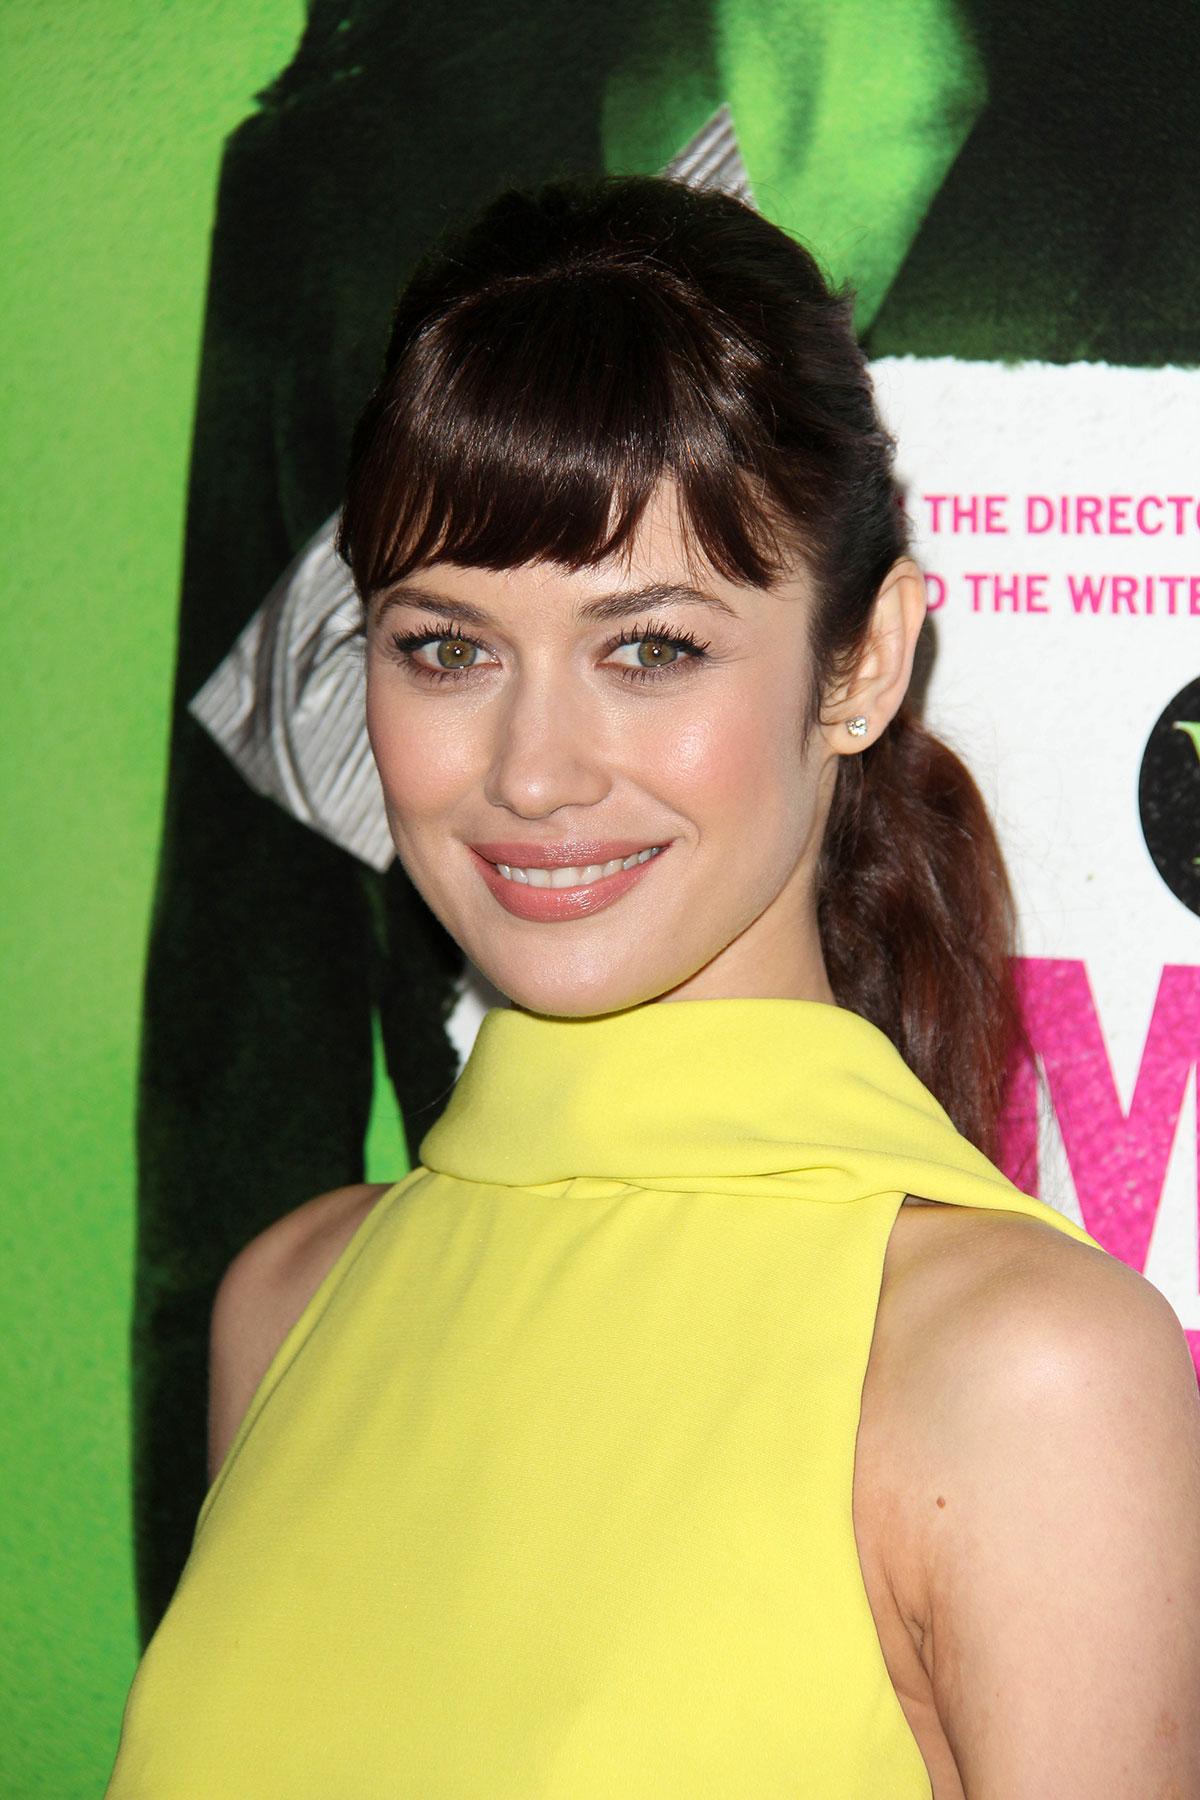 OLGA KURYLENKO at Vampire Academy Premiere in Los Angeles - HawtCelebs ...